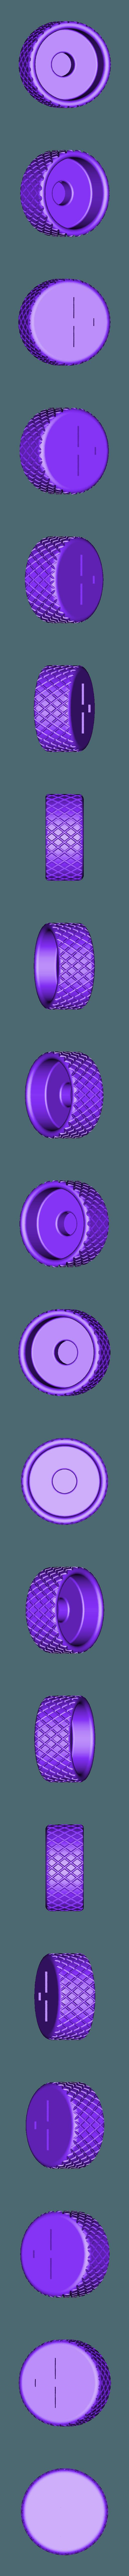 Cap%2B_knurled.stl Download free STL file 18mm Li-ion Battery Magnetic Connector • 3D printer model, VICLER